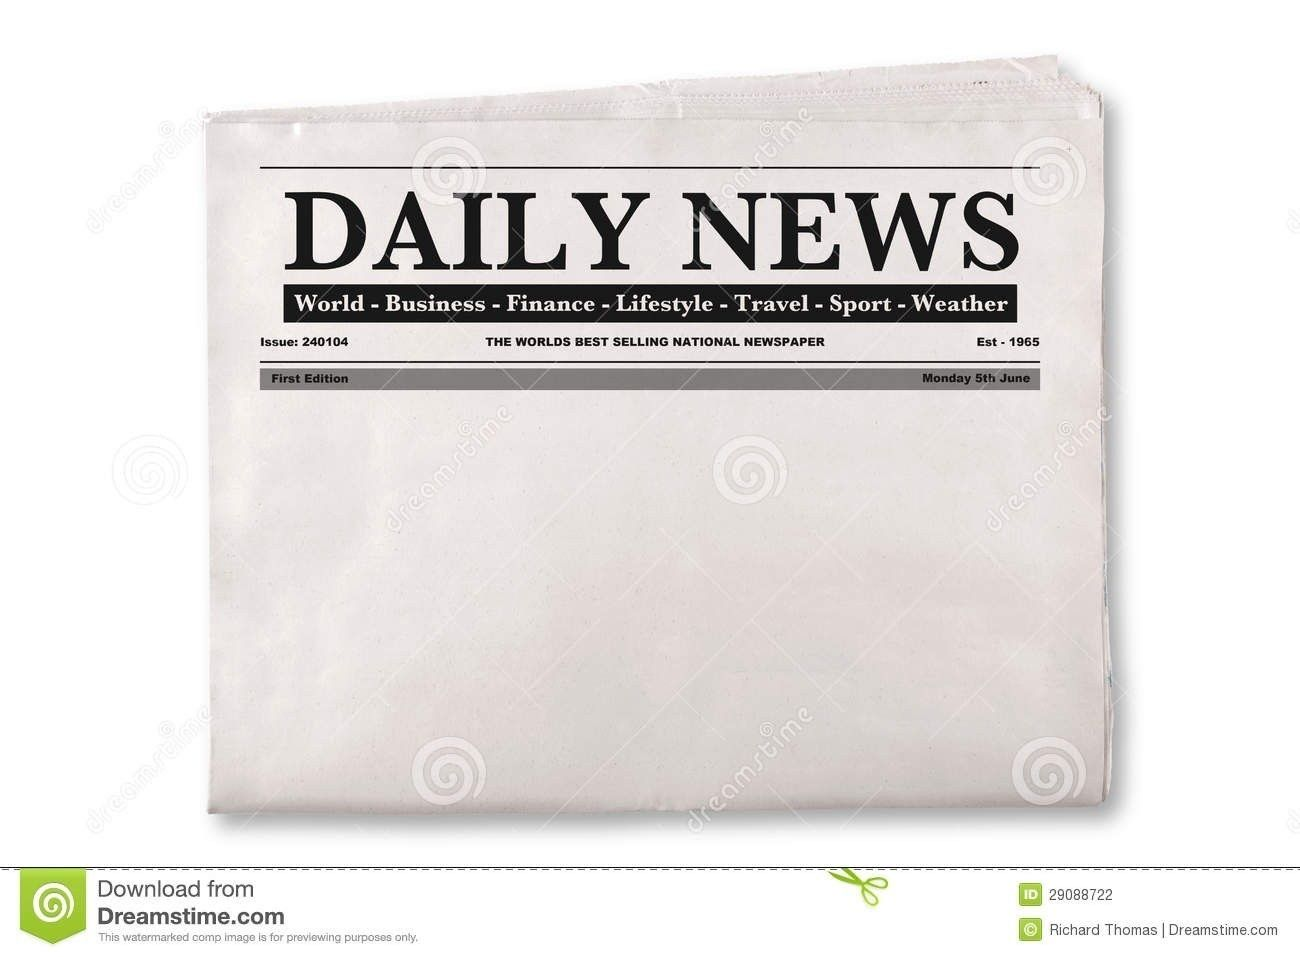 Blank Newspaper Png 1 El Parga Pertaining To Blank Newspaper Png 201820623 Blank Newspaper Newspaper Newspaper Template